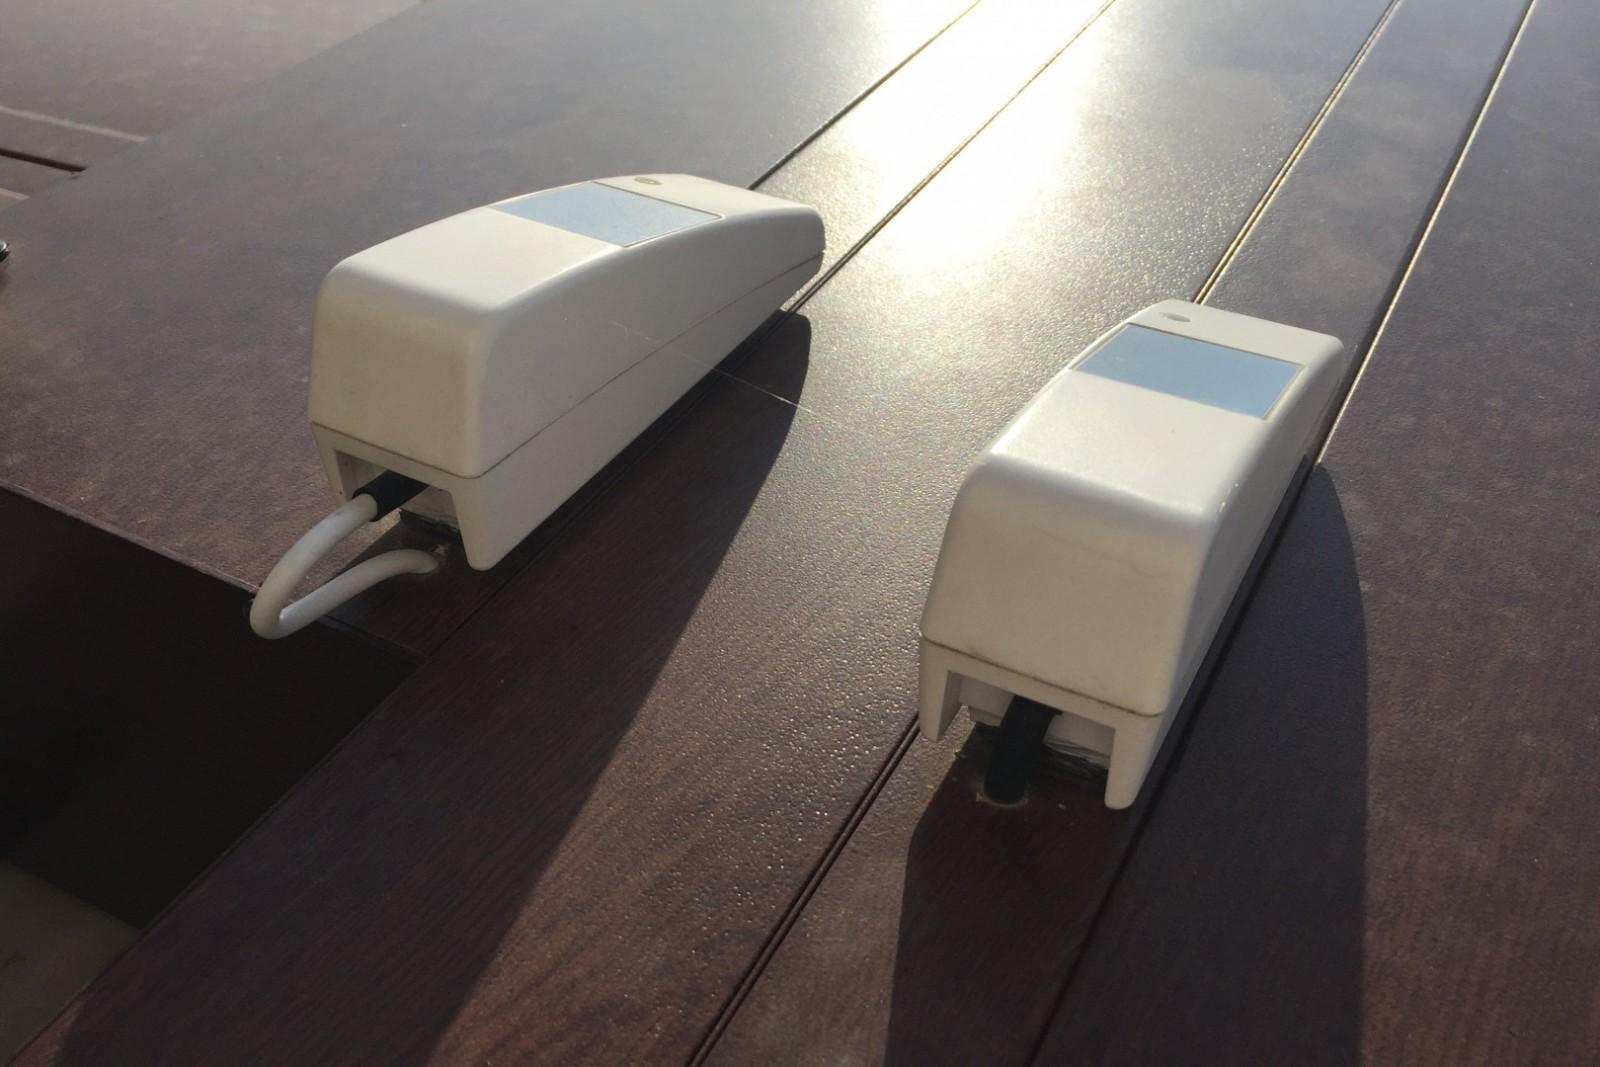 Weather Sensors 1